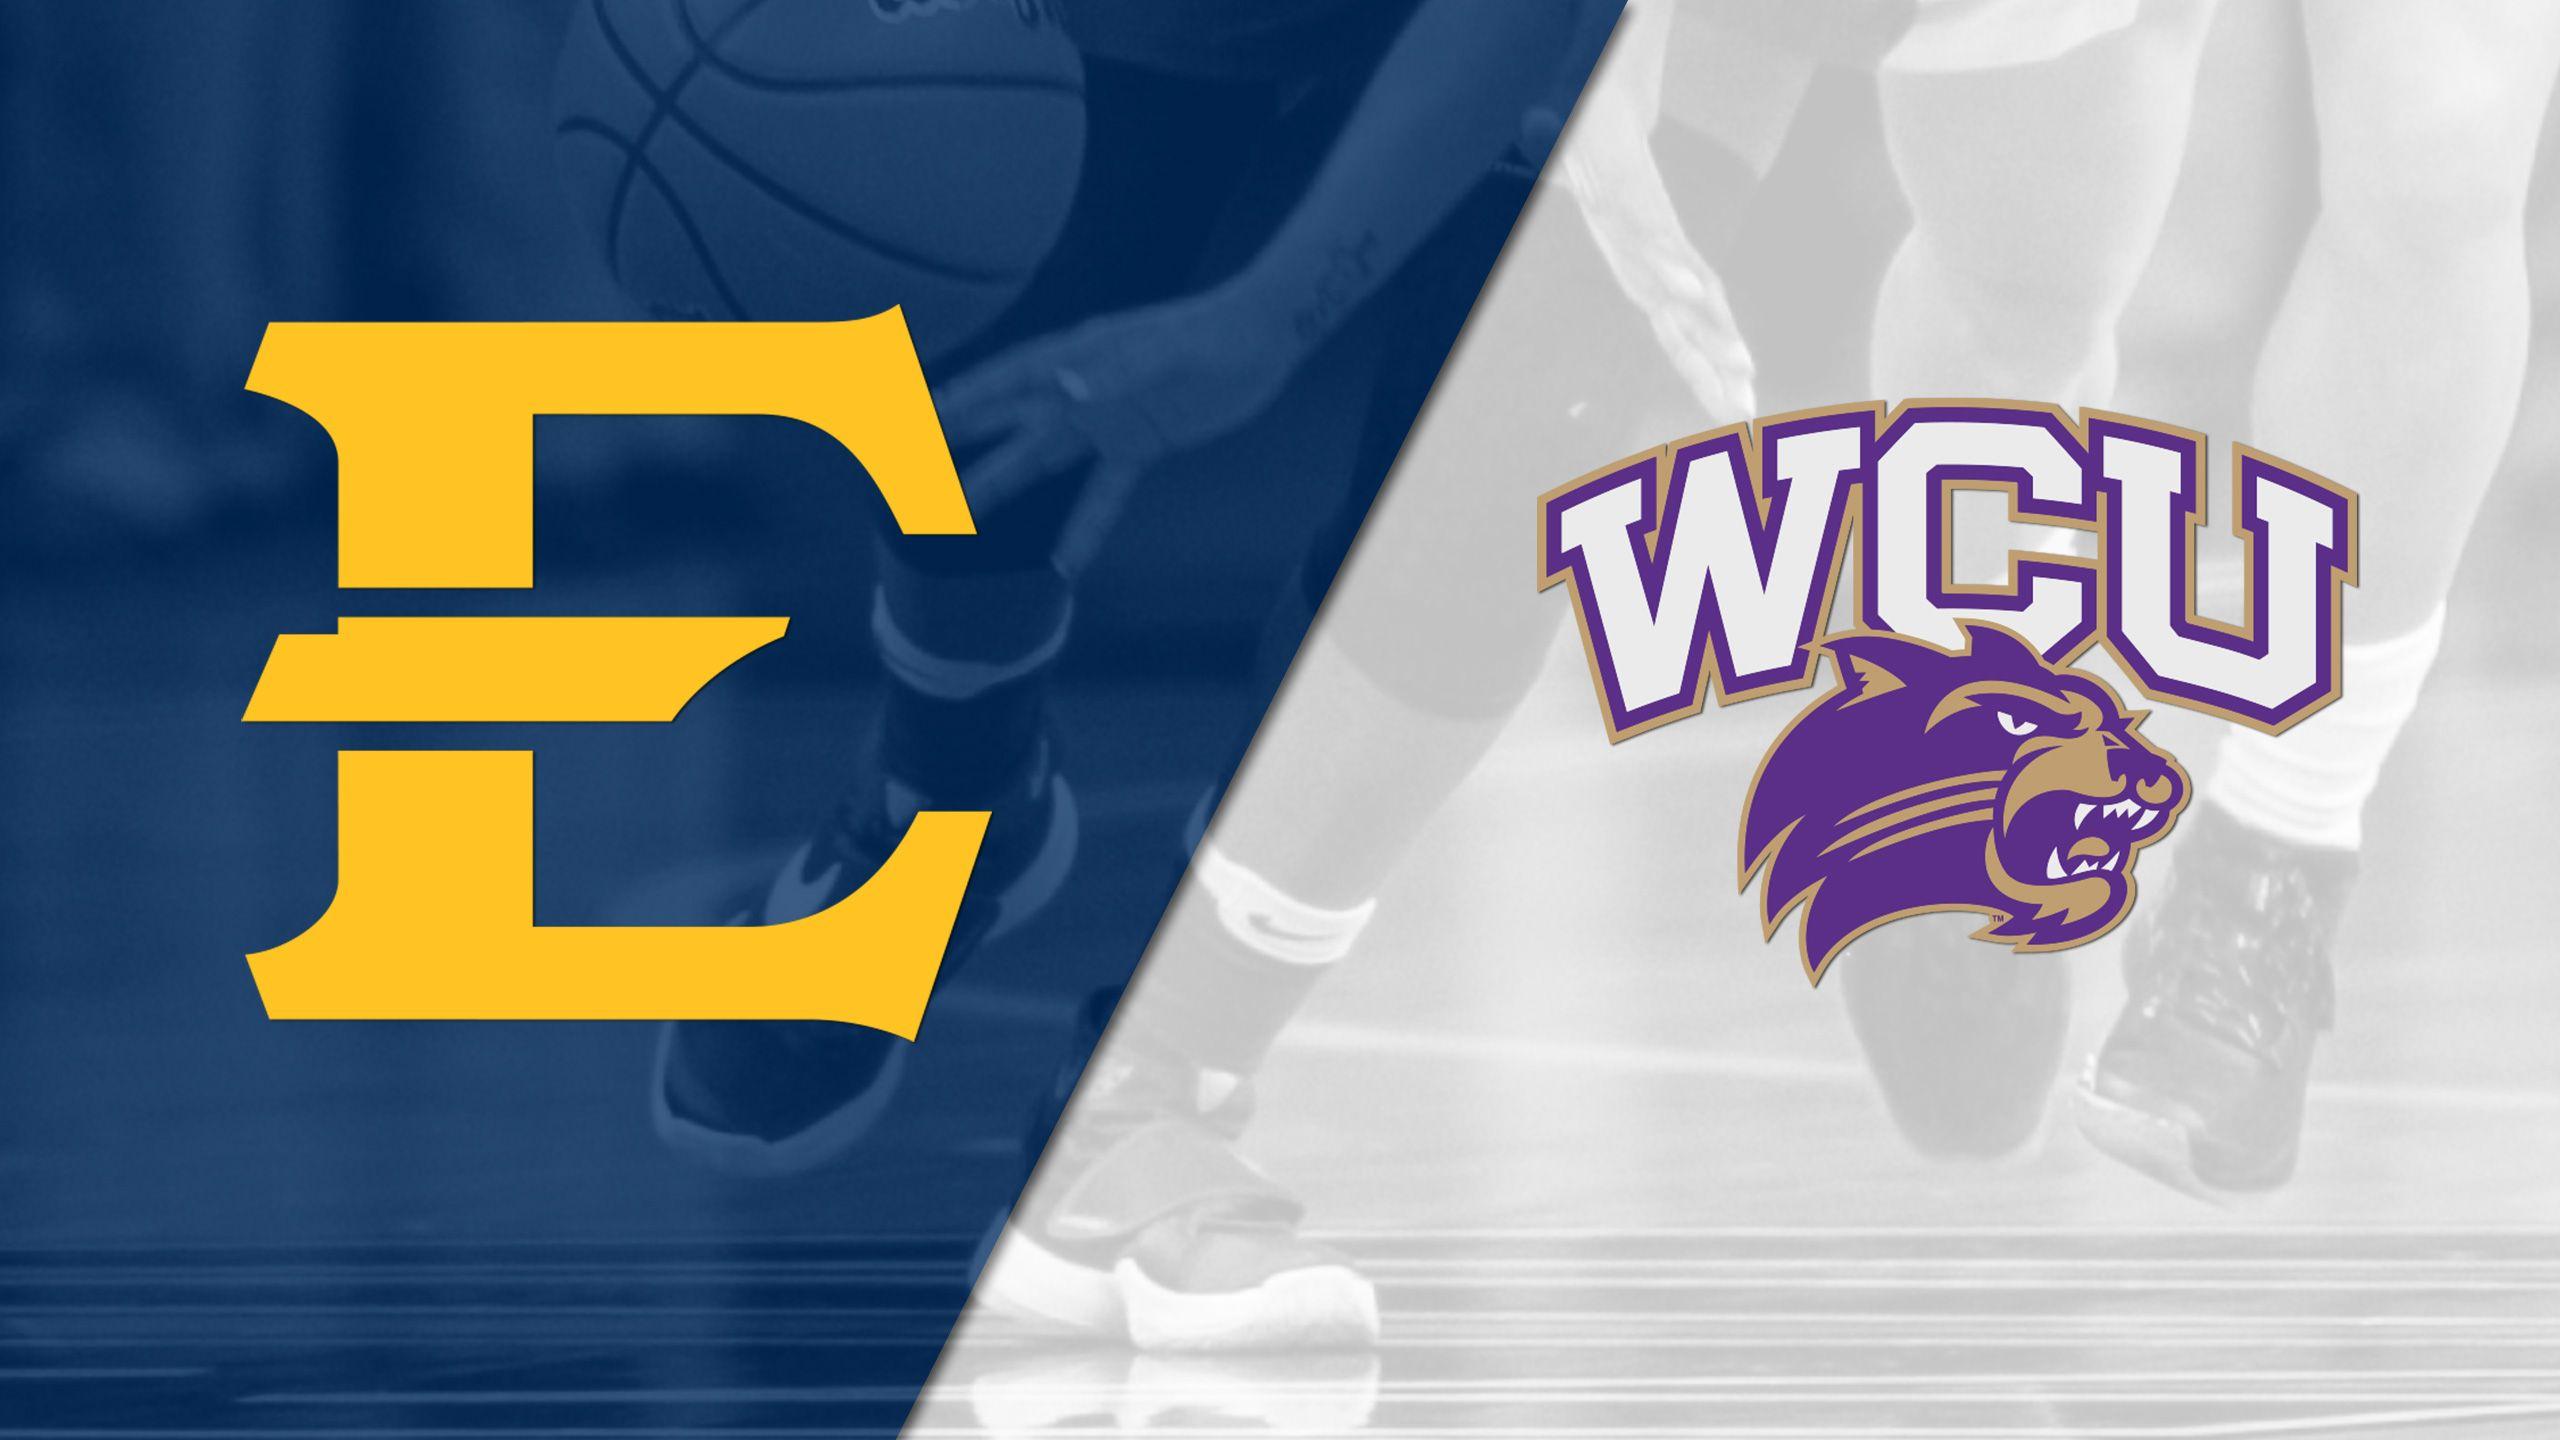 East Tennessee State vs. Western Carolina (W Basketball)